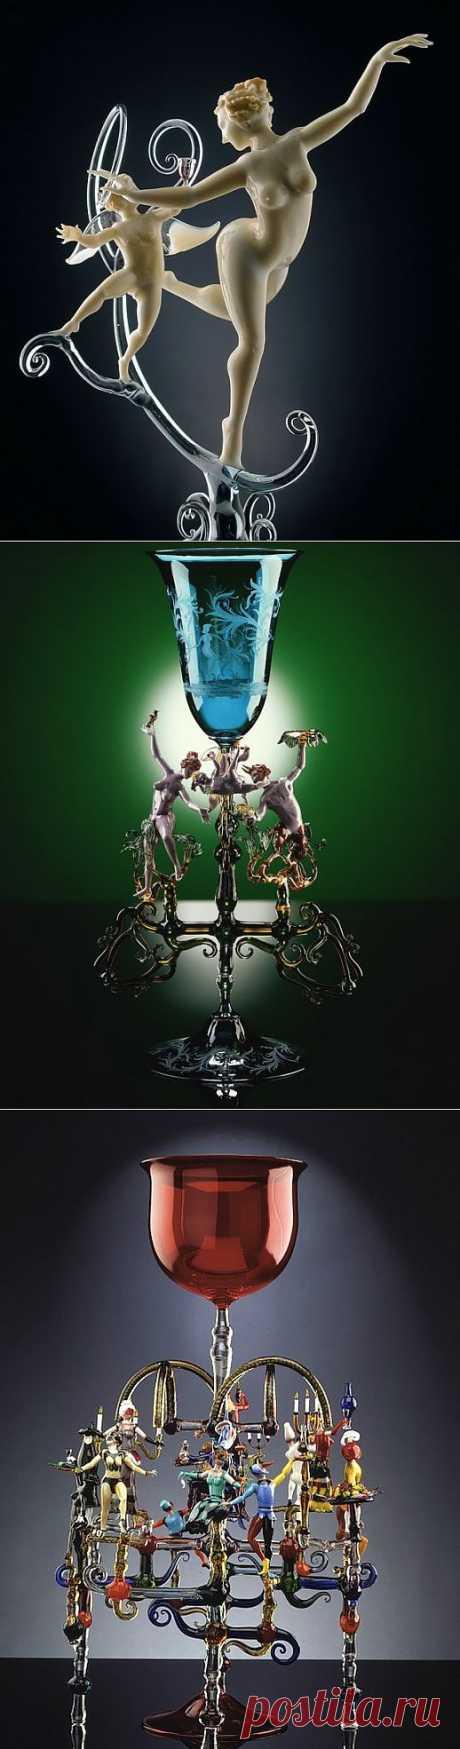 Lucio Bubacco /// Муранское стекло | Искусство